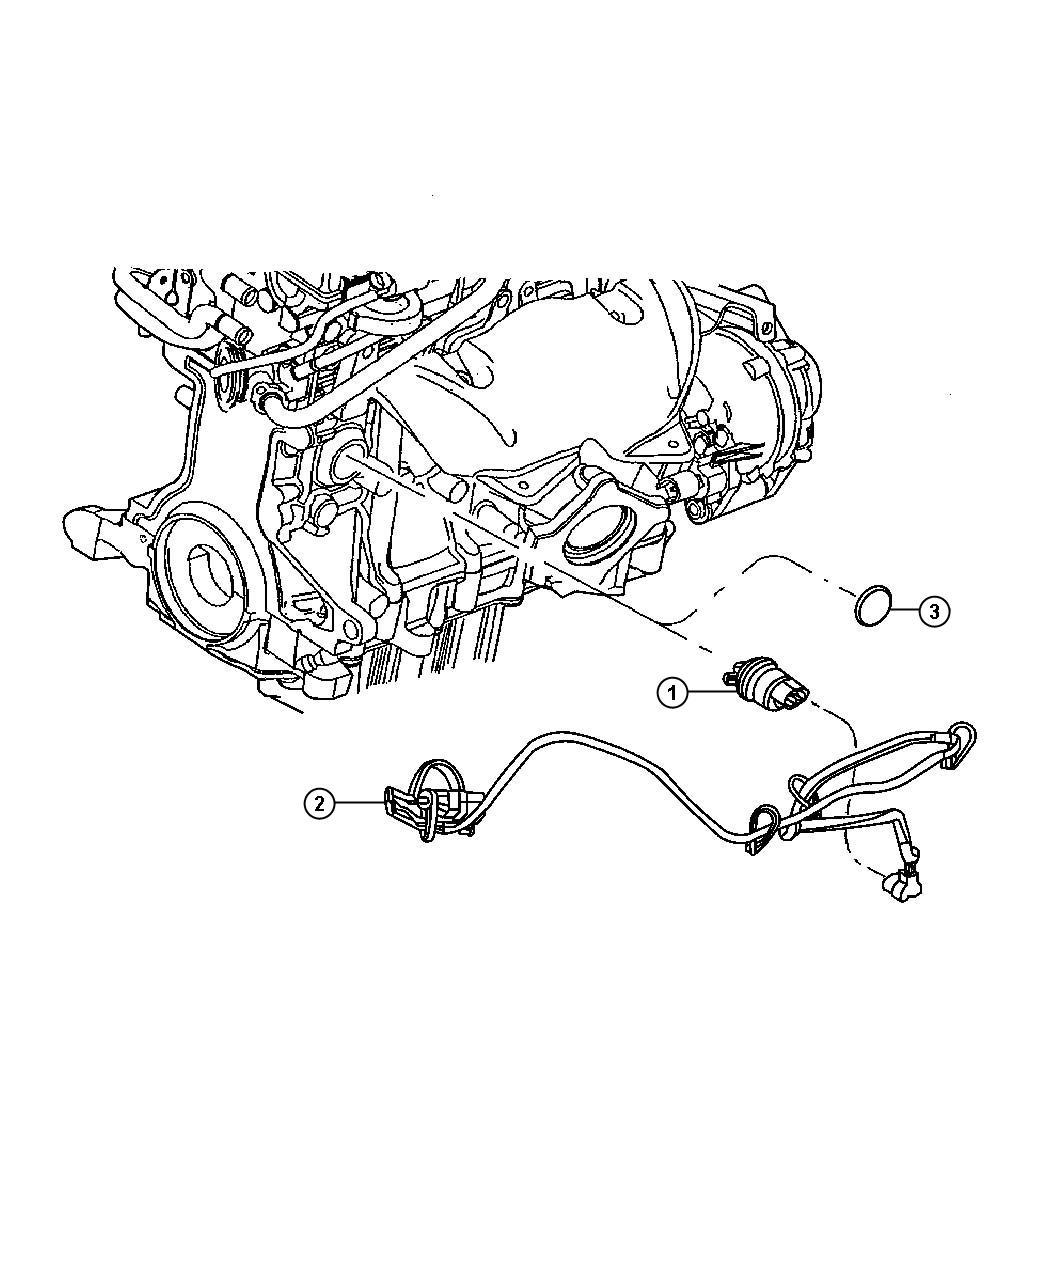 Plymouth Neon Cord Engine Block Heater Smpiengine